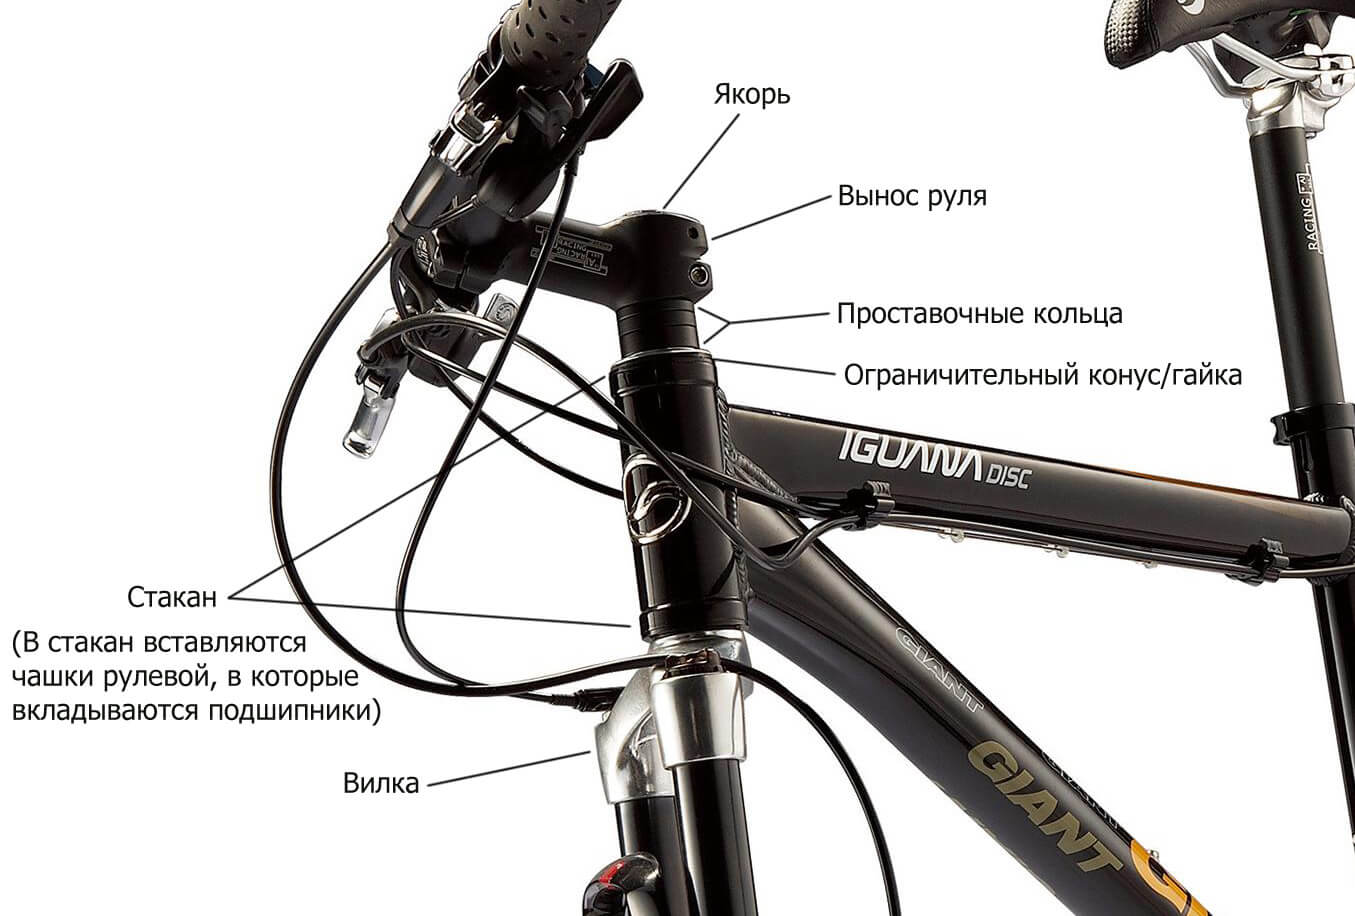 remont velosipeda